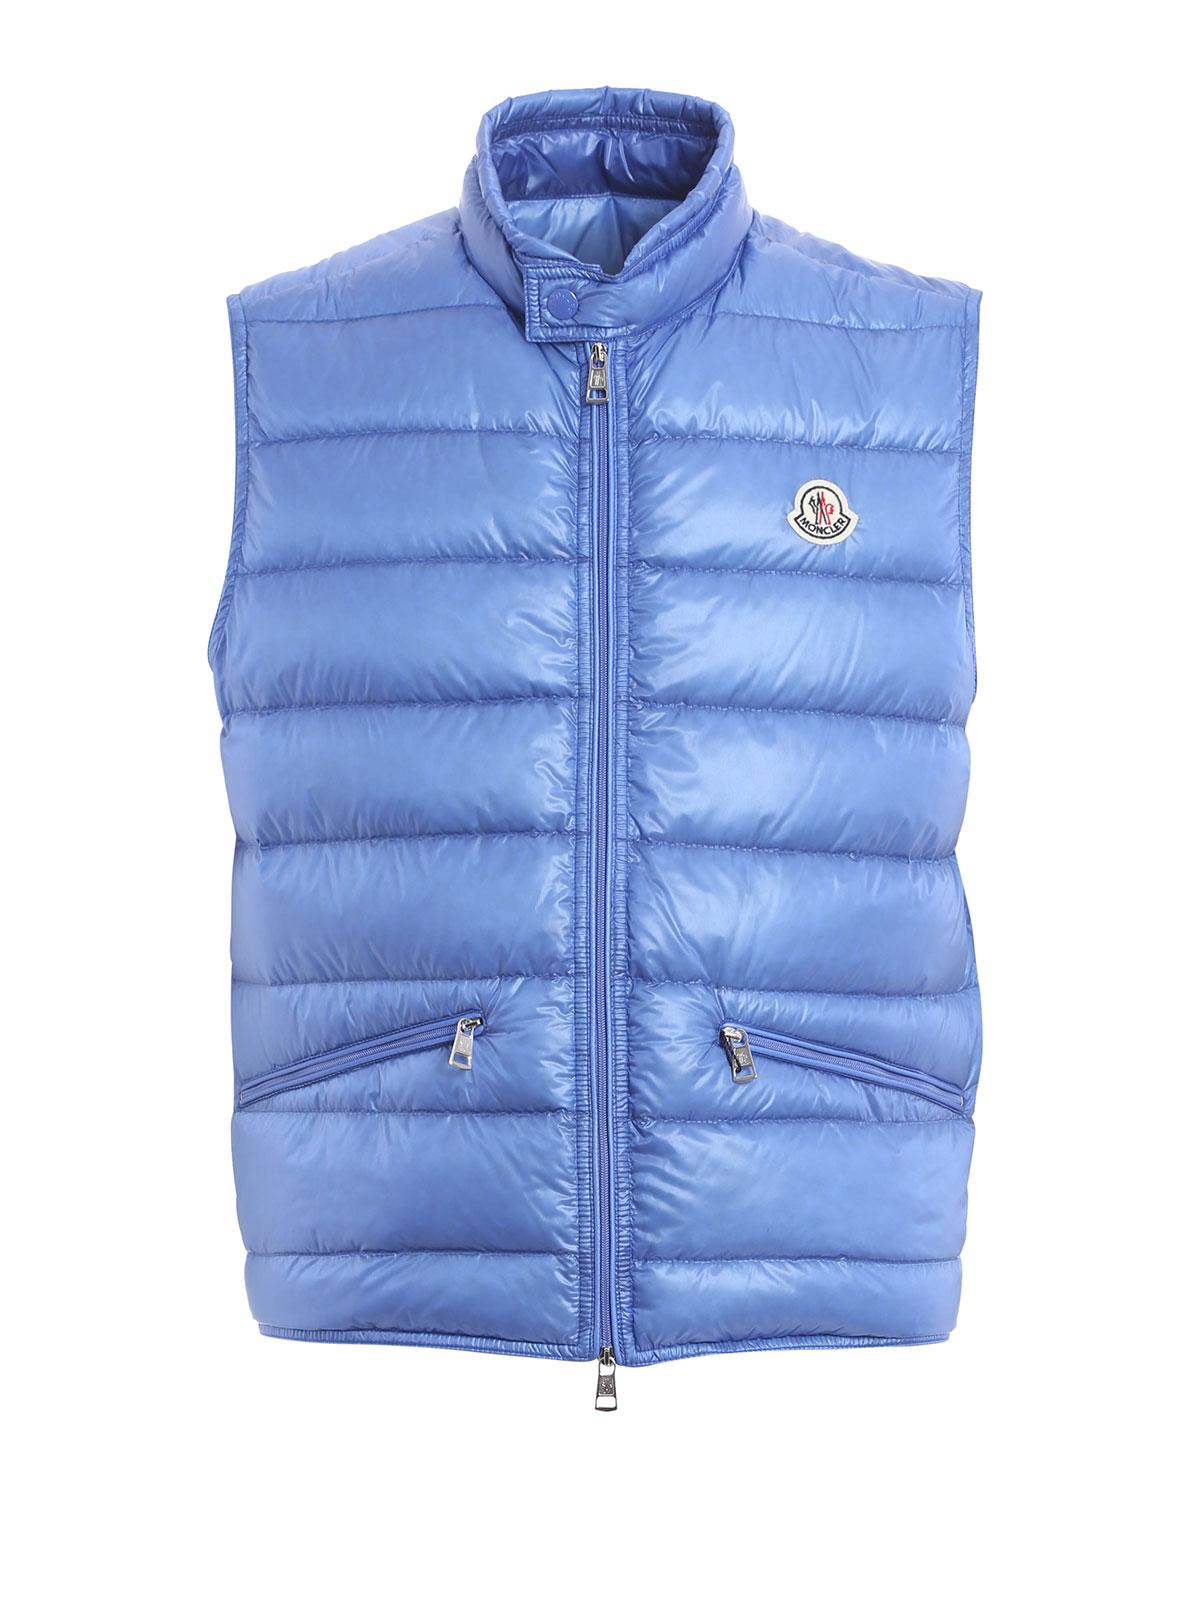 moncler blaue jacke, Moncler Mütze Blau Damen bestellen